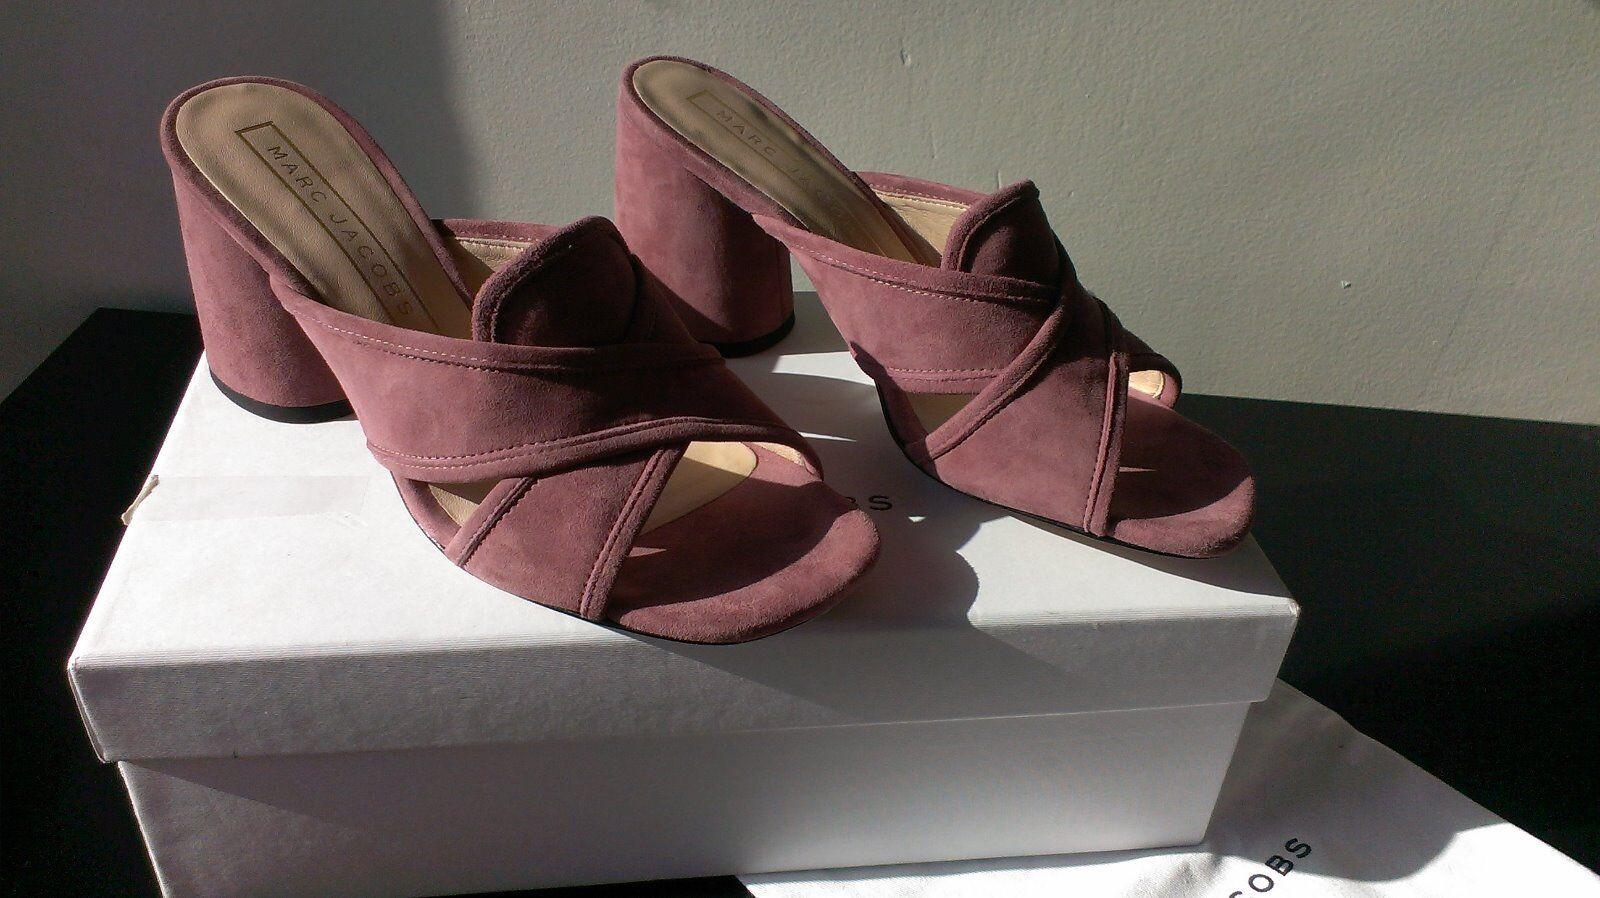 Marc Jacobs zapatos mule sabot daim 37 rosado neuves pointure 37 daim 6502eb